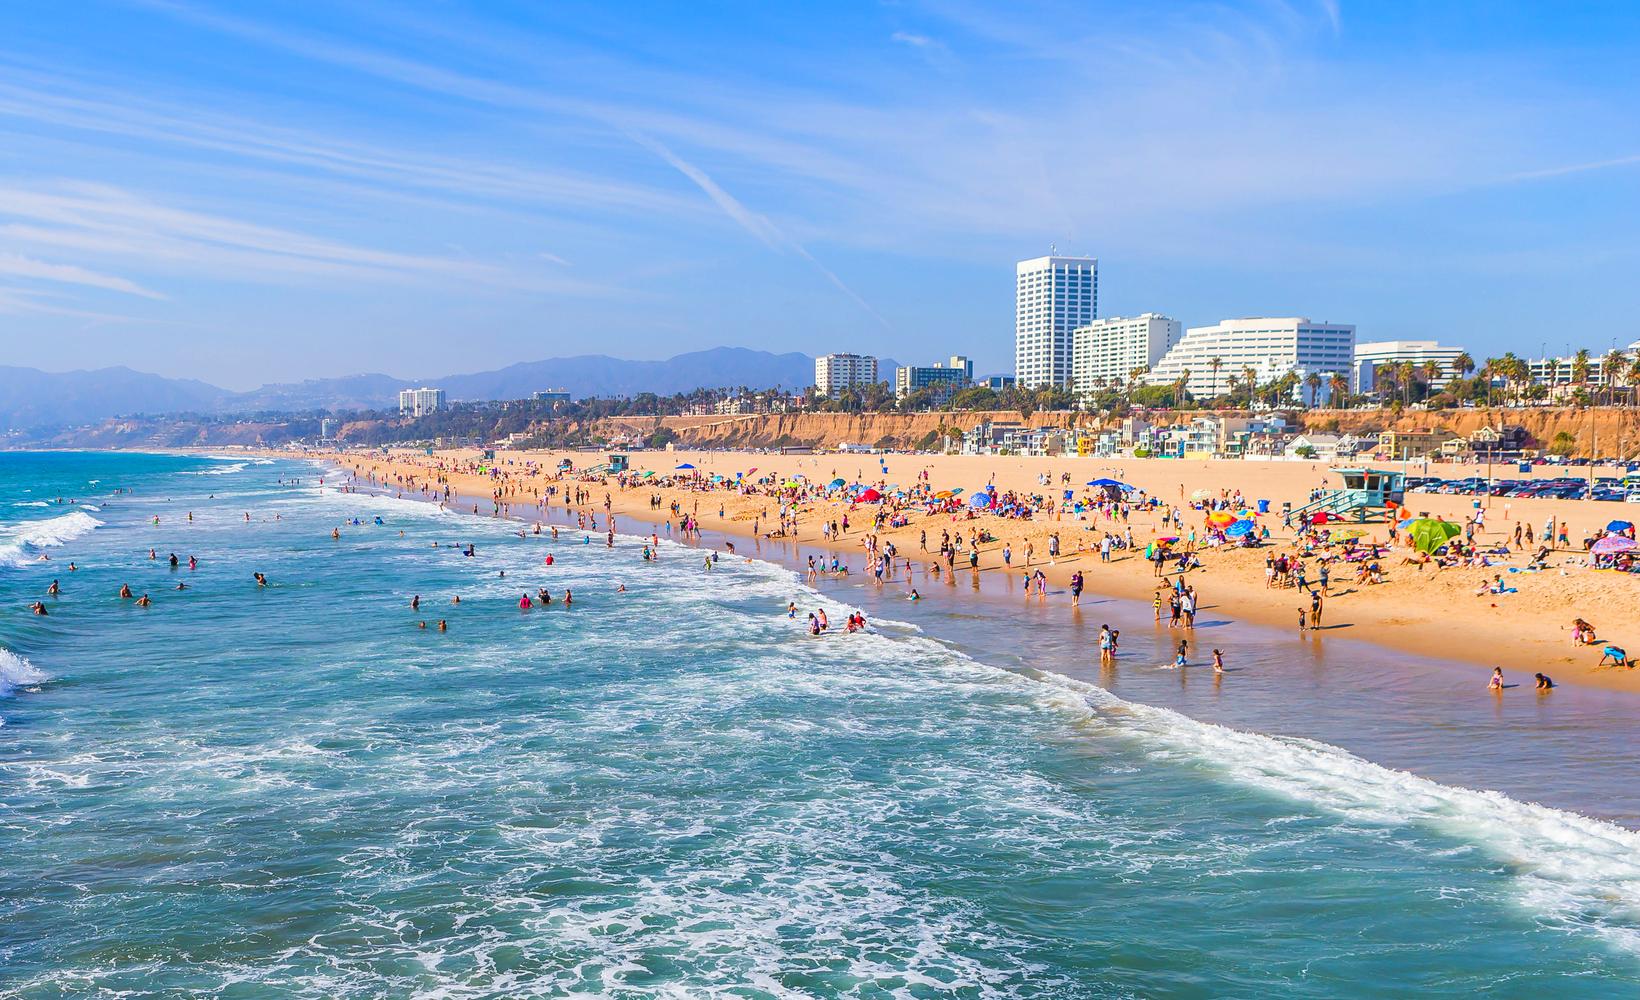 SantaMonica-Kalifornien-Strand-Thinkstock534610535